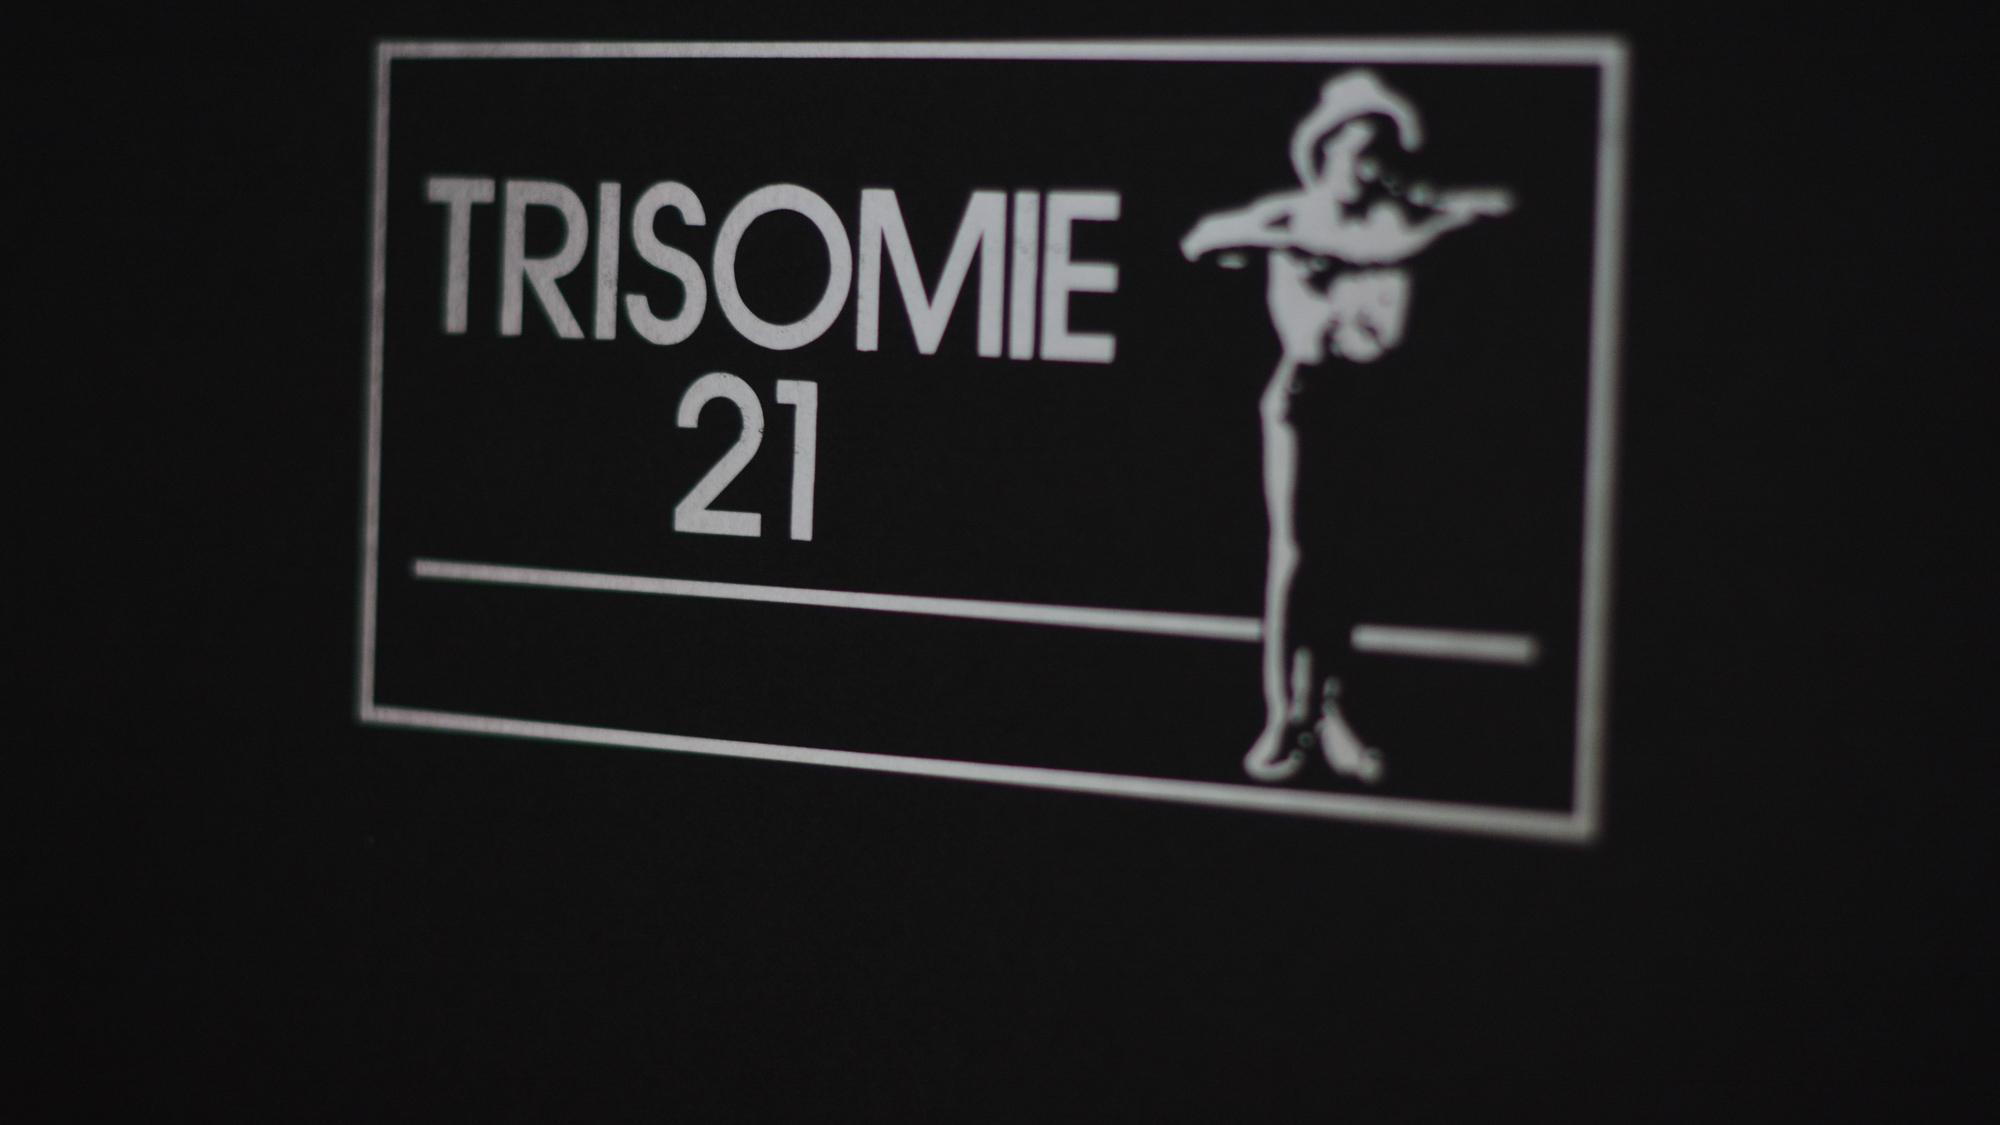 trisomie 21 - chapter I-IV